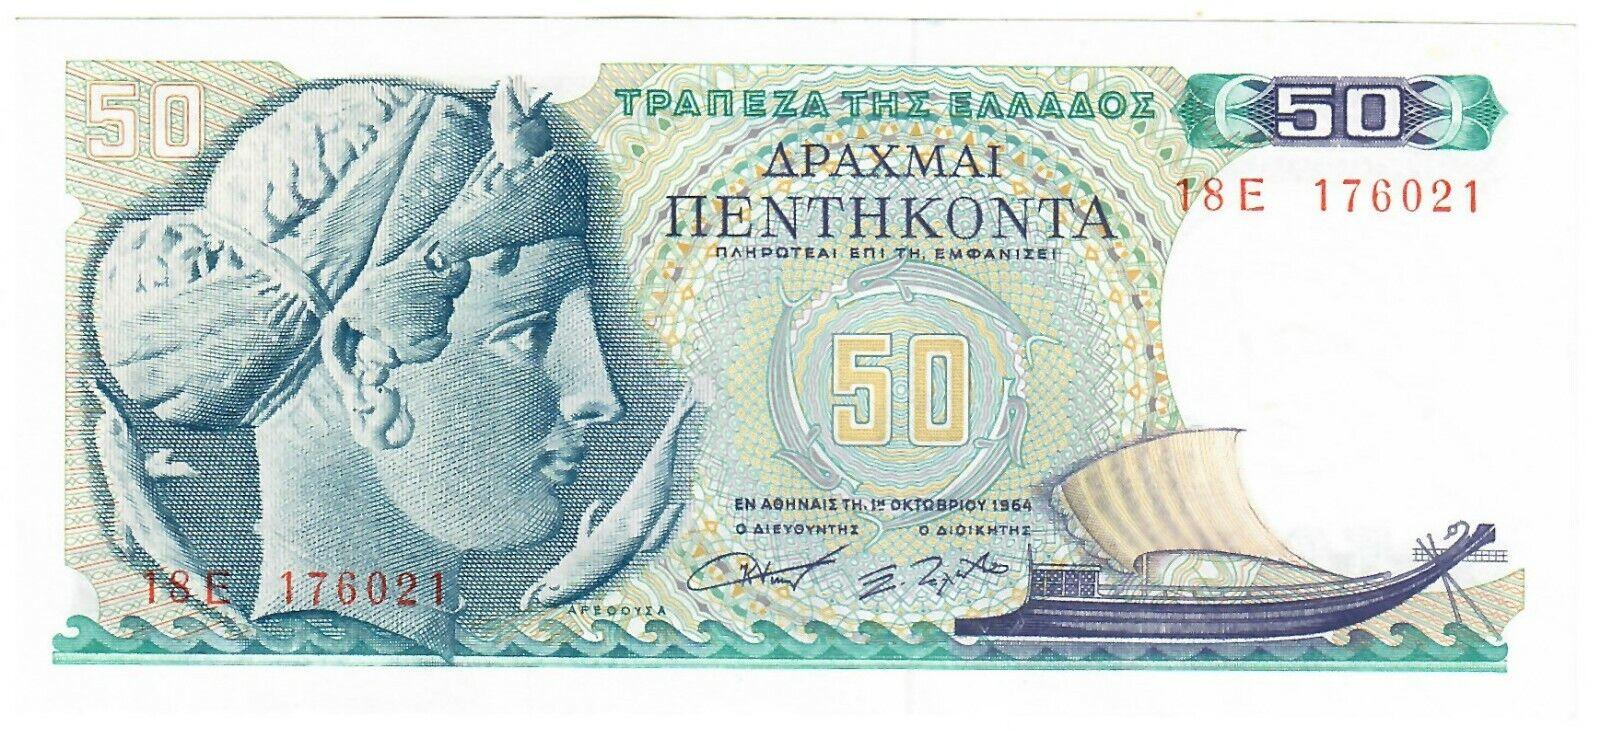 Greece 50 Drachma 1964 UNC